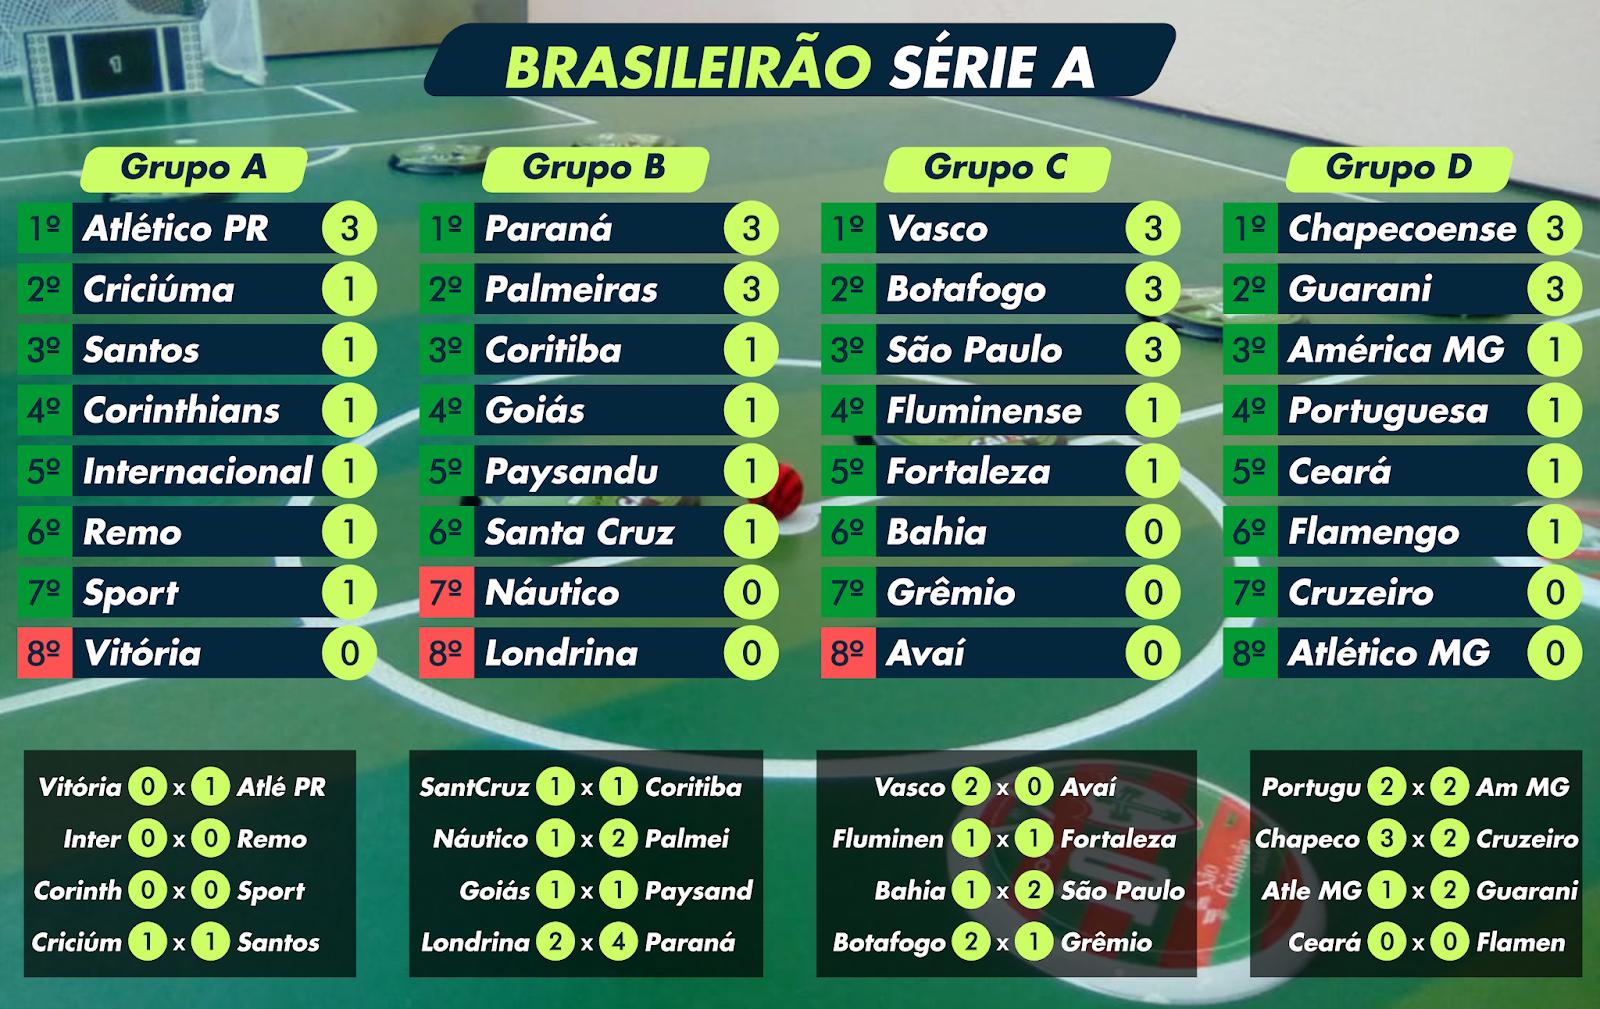 Artes Para Futebol De Botao Brasileirao Serie A 1ª Rodada